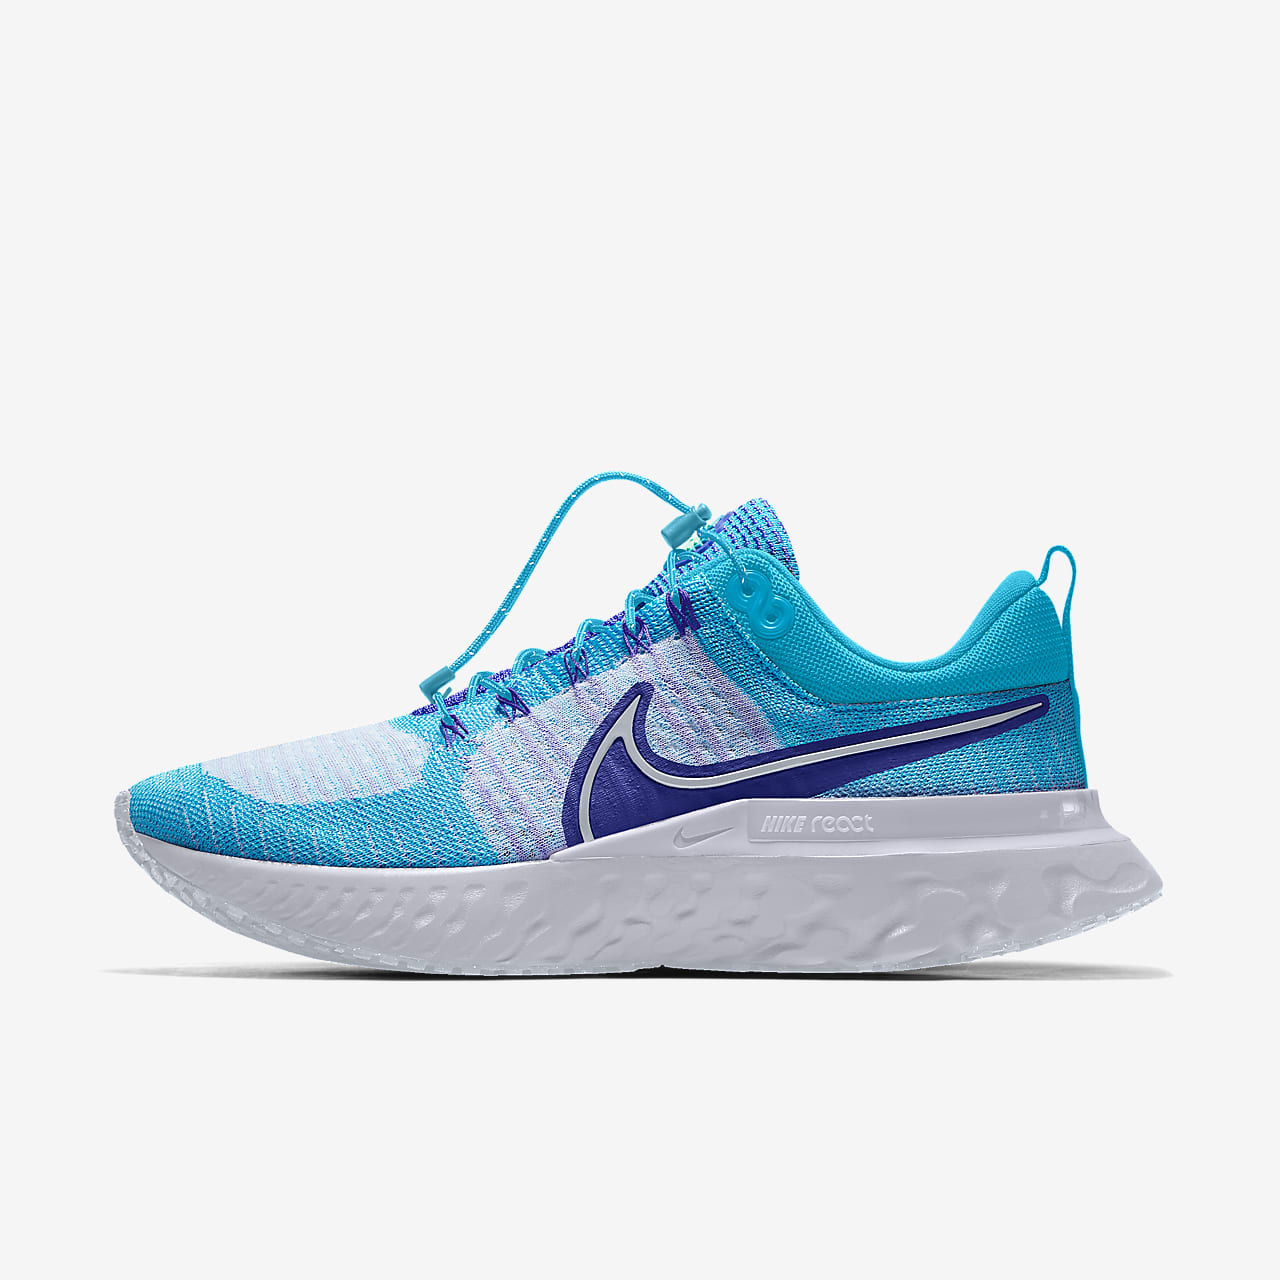 Nike React Infinity Run Flyknit 2 By You personalisierbarer Laufschuh